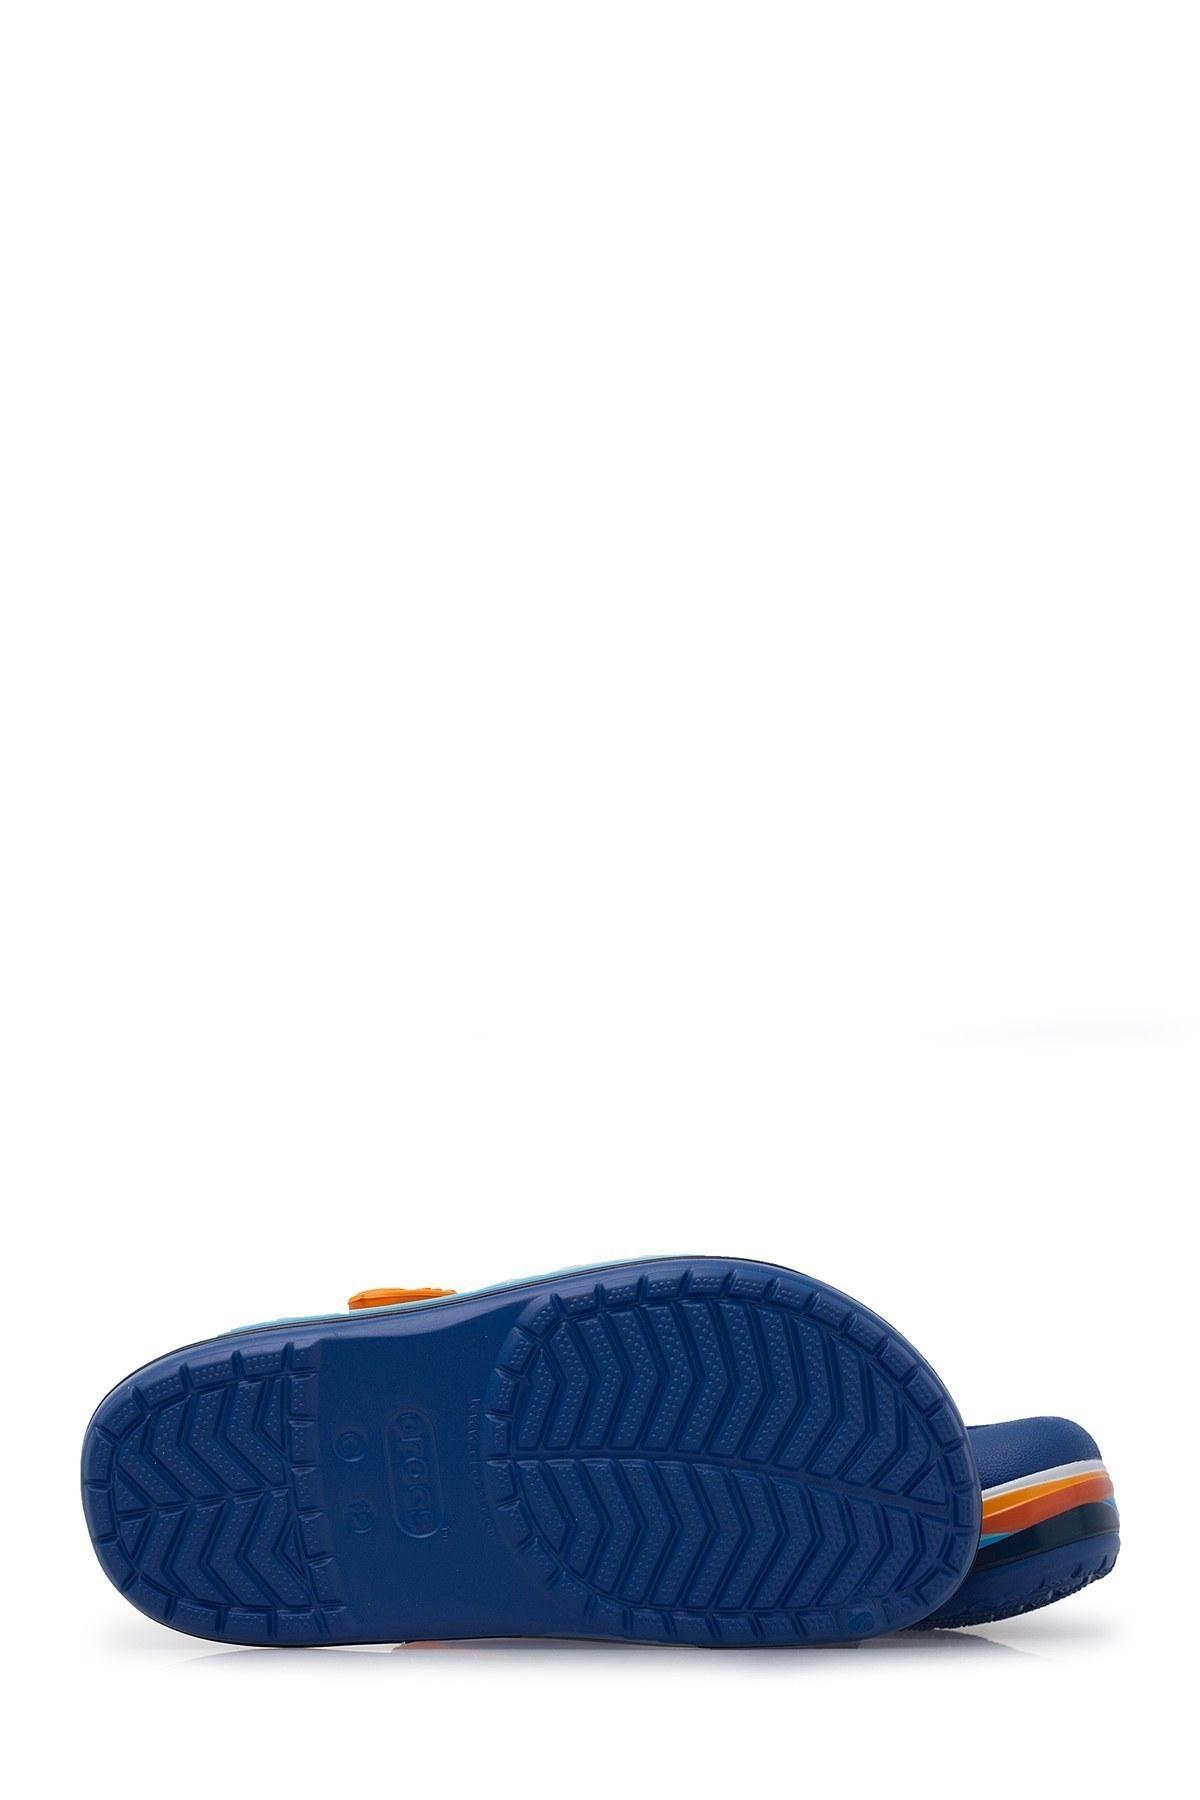 Crocs Crocband Erkek Çocuk Terlik 205697 CR0649-4GX LACİVERT